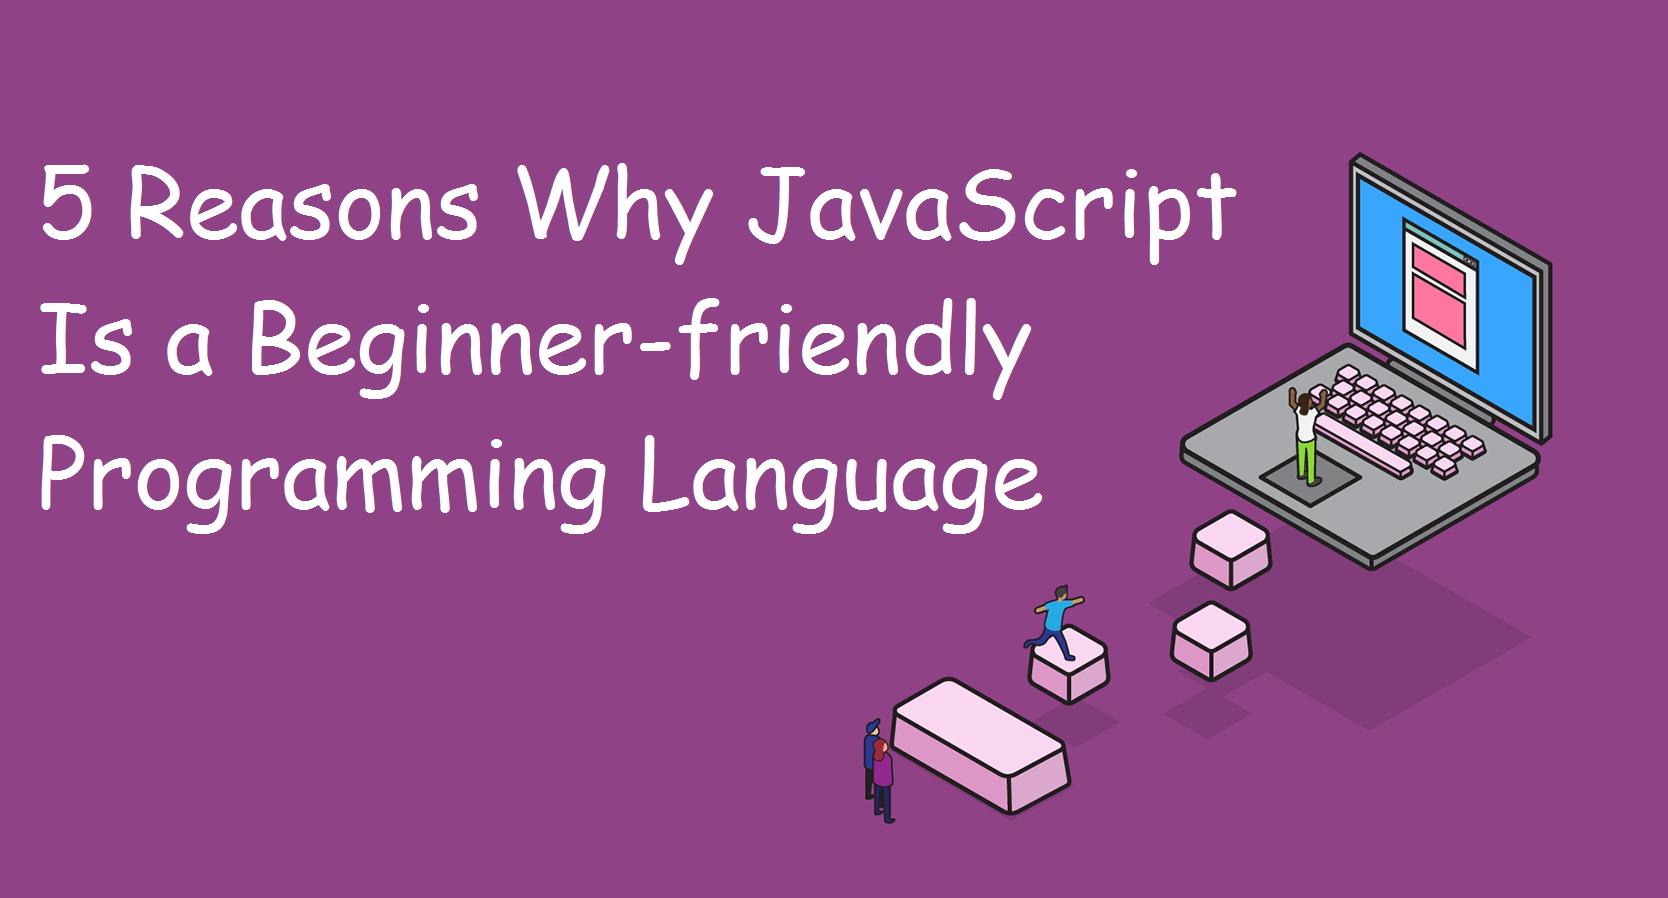 JavaScript Is a Beginner-friendly Programming Language